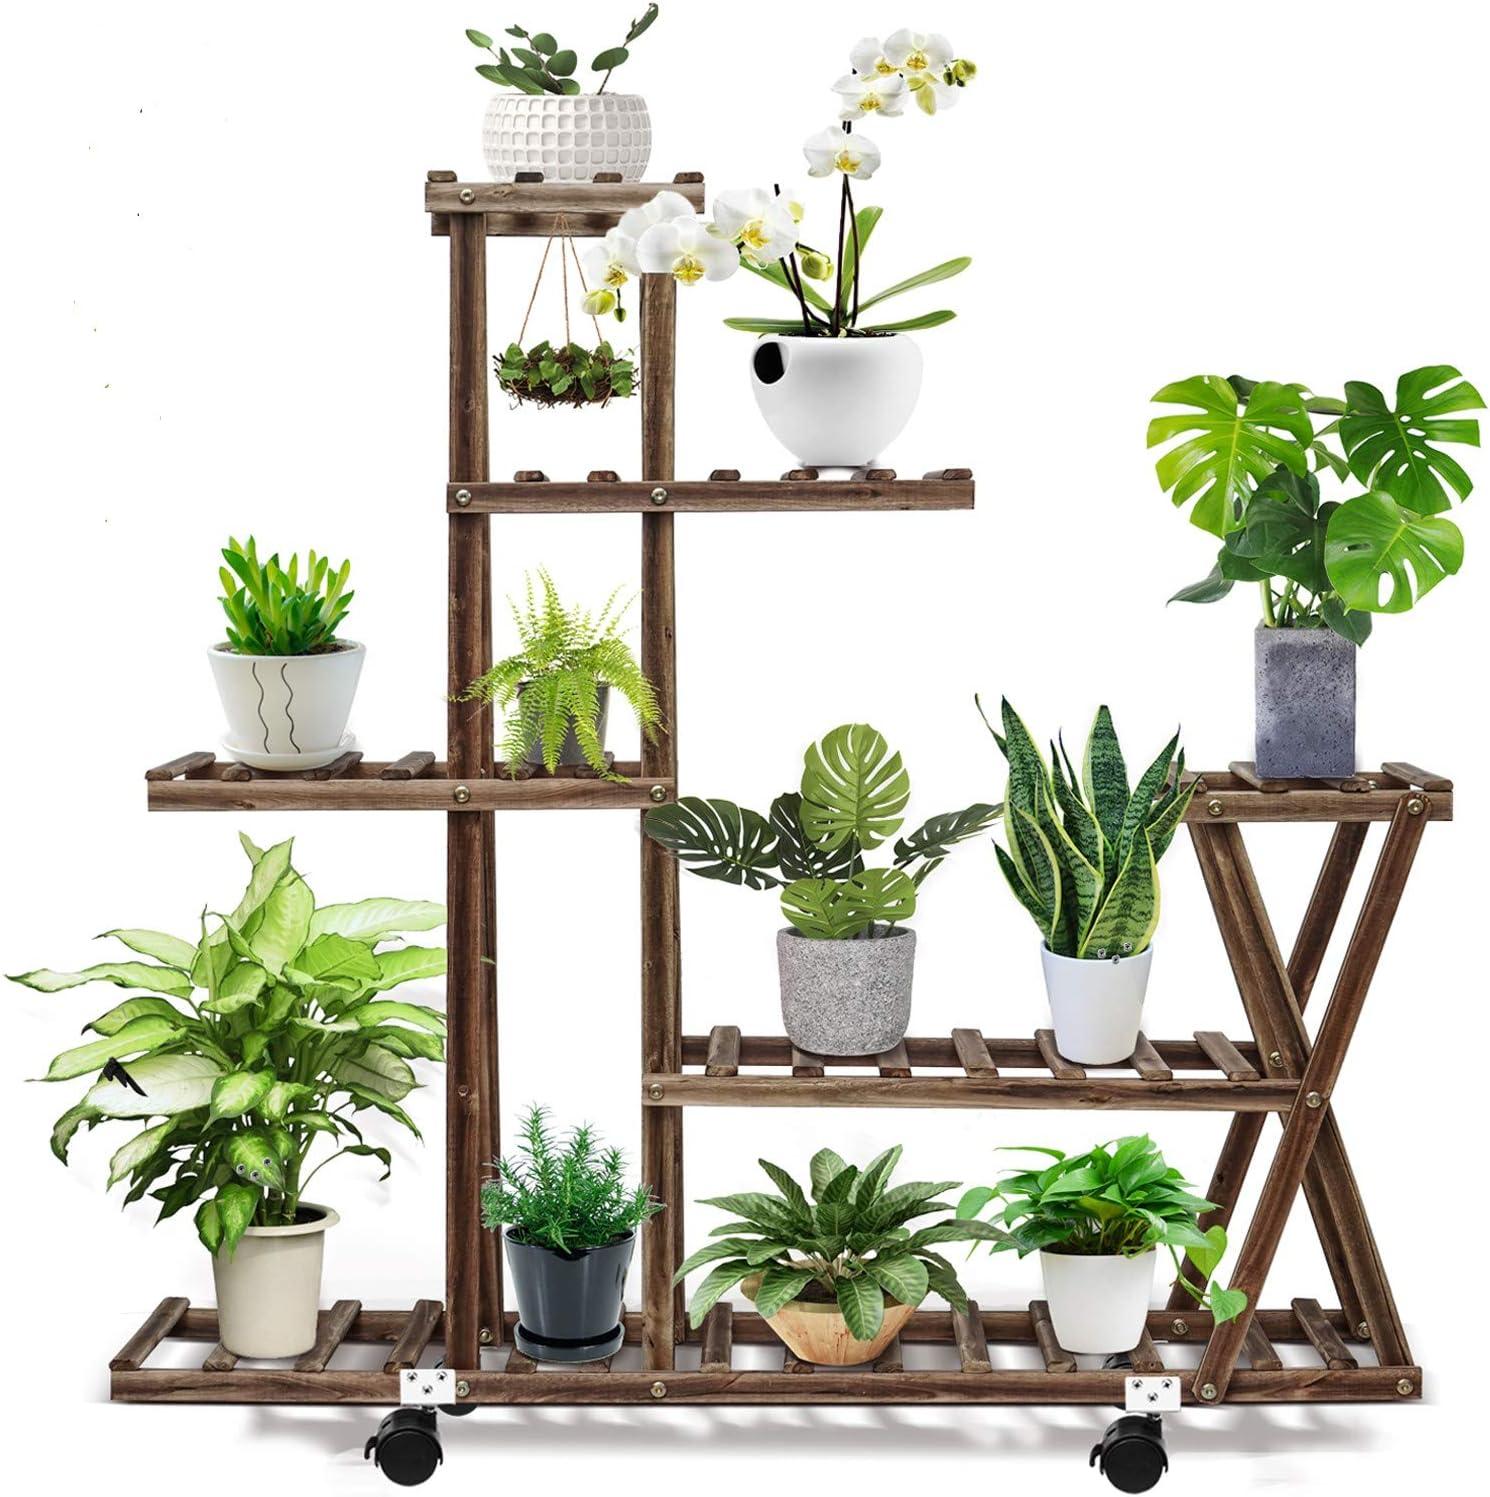 16+ cfmour Wood Plant Stand Indoor Outdoor, Plant Display Multi Tier Flower  Shelves Stands, Garden Plant Shelf Rack Holder in Corner Living Room  Balcony ... Bilder